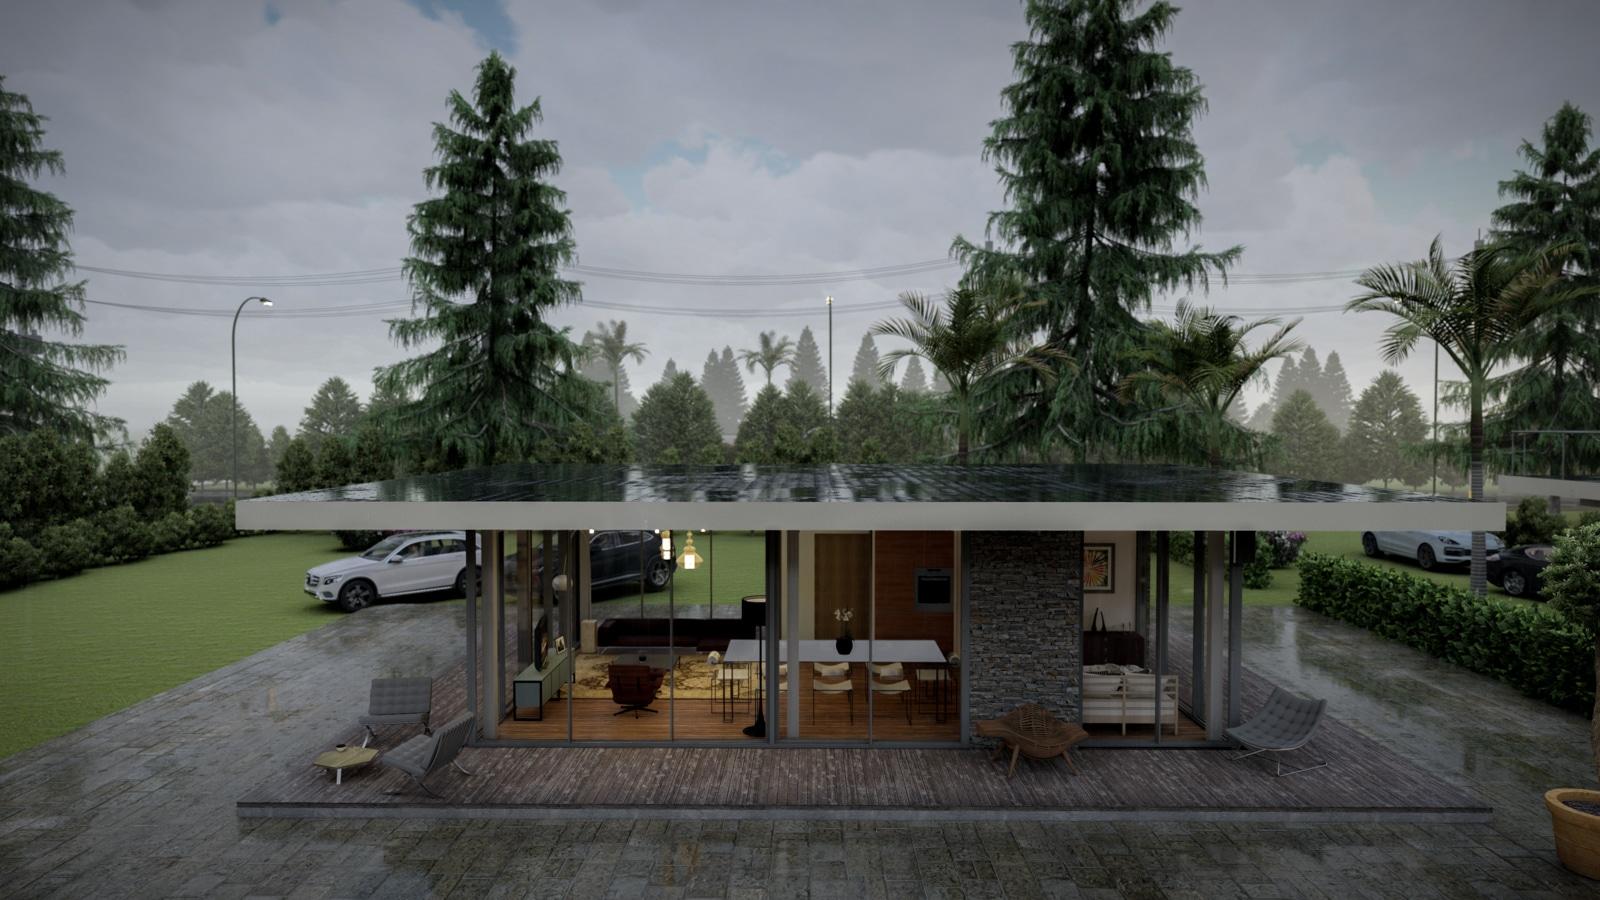 renderizado 3D diseños arquitectónicos